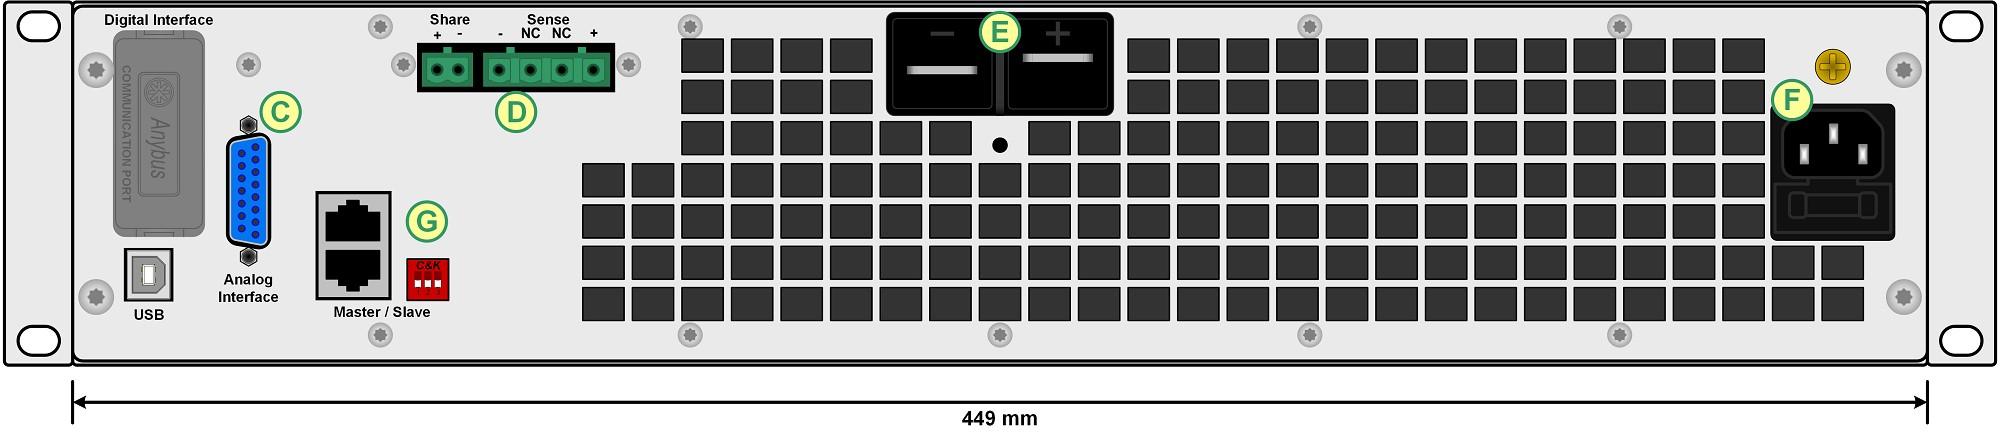 EPS/EL 9200-35B-2Q Elektronische Last